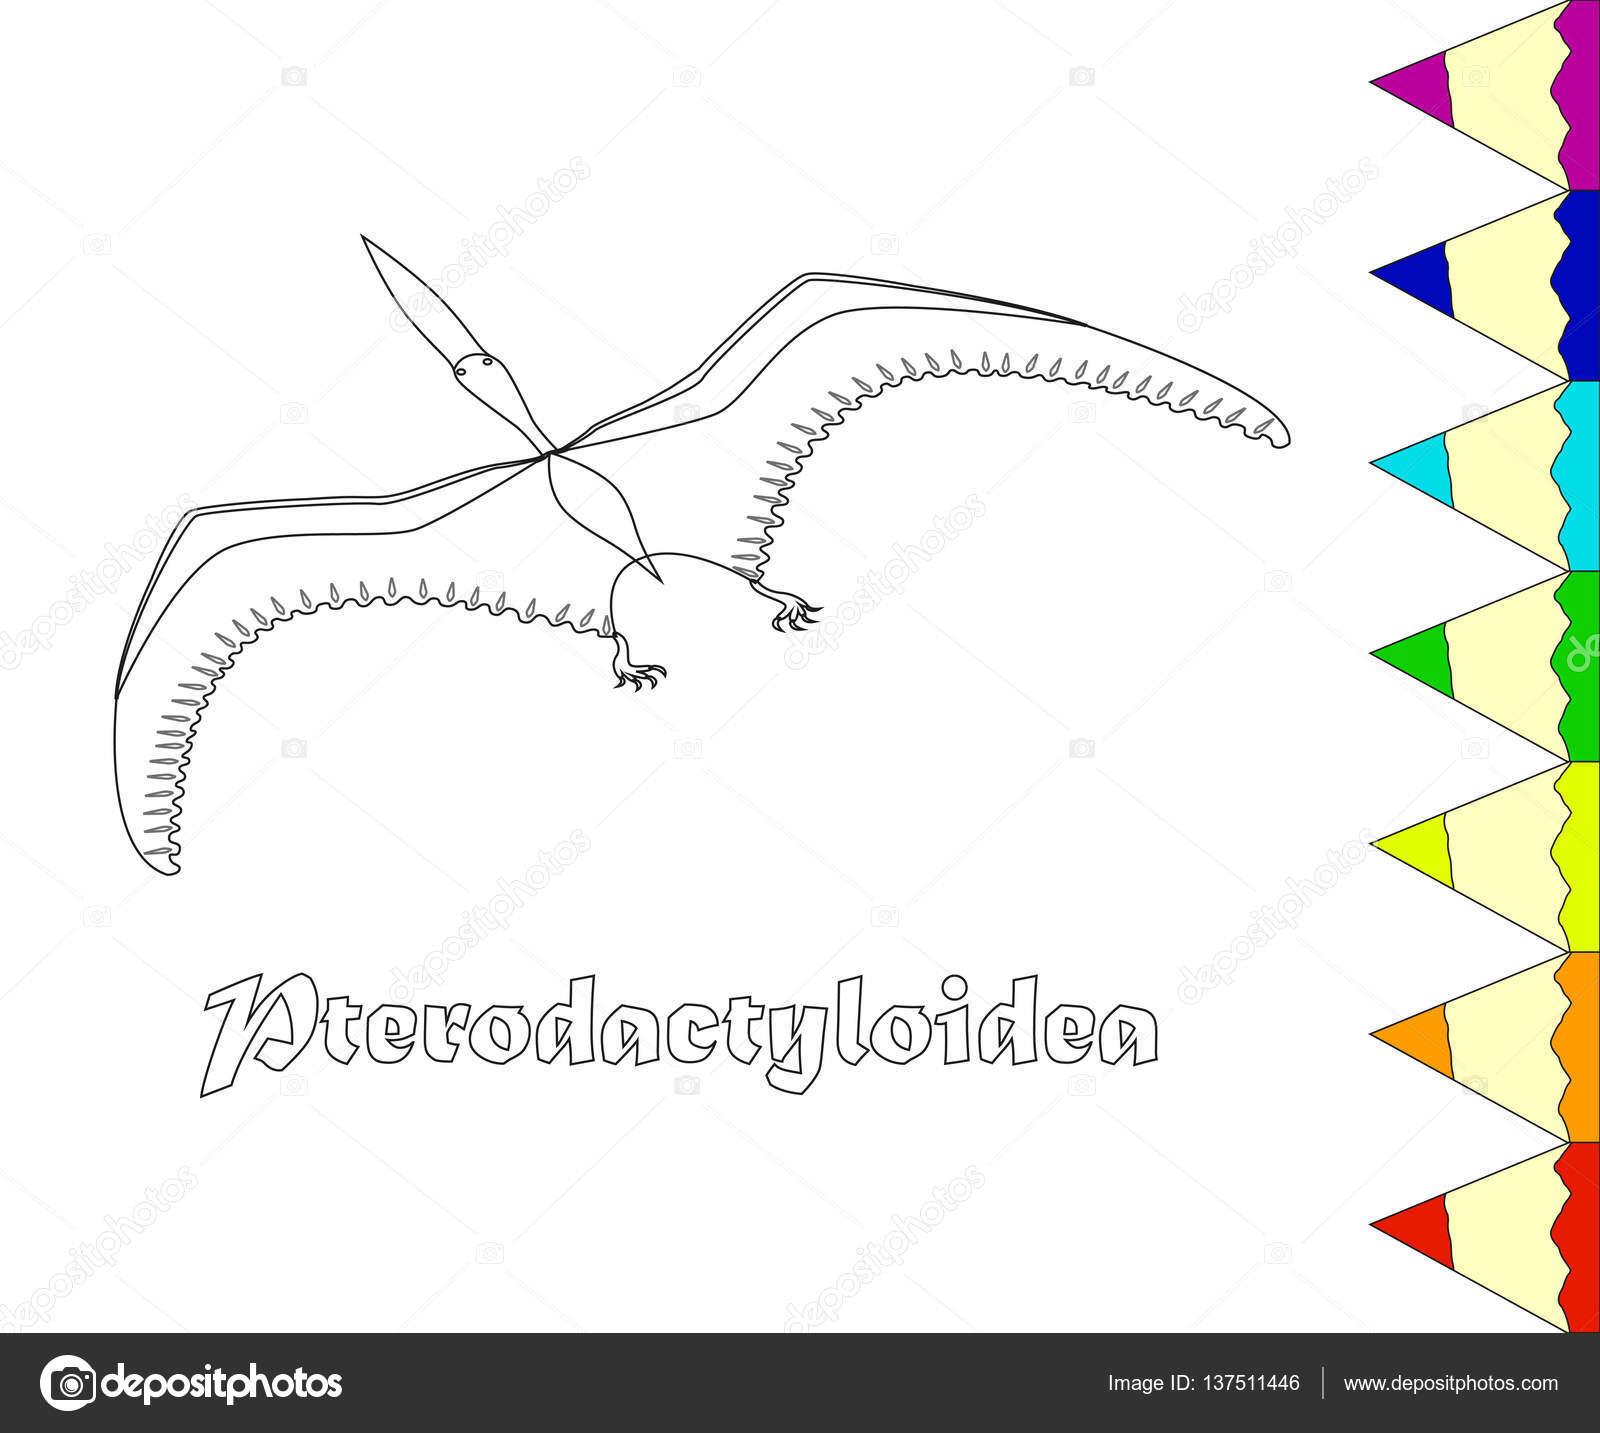 Malvorlagen Dinosaurier, Pterodactyloidea, — Stockvektor ...